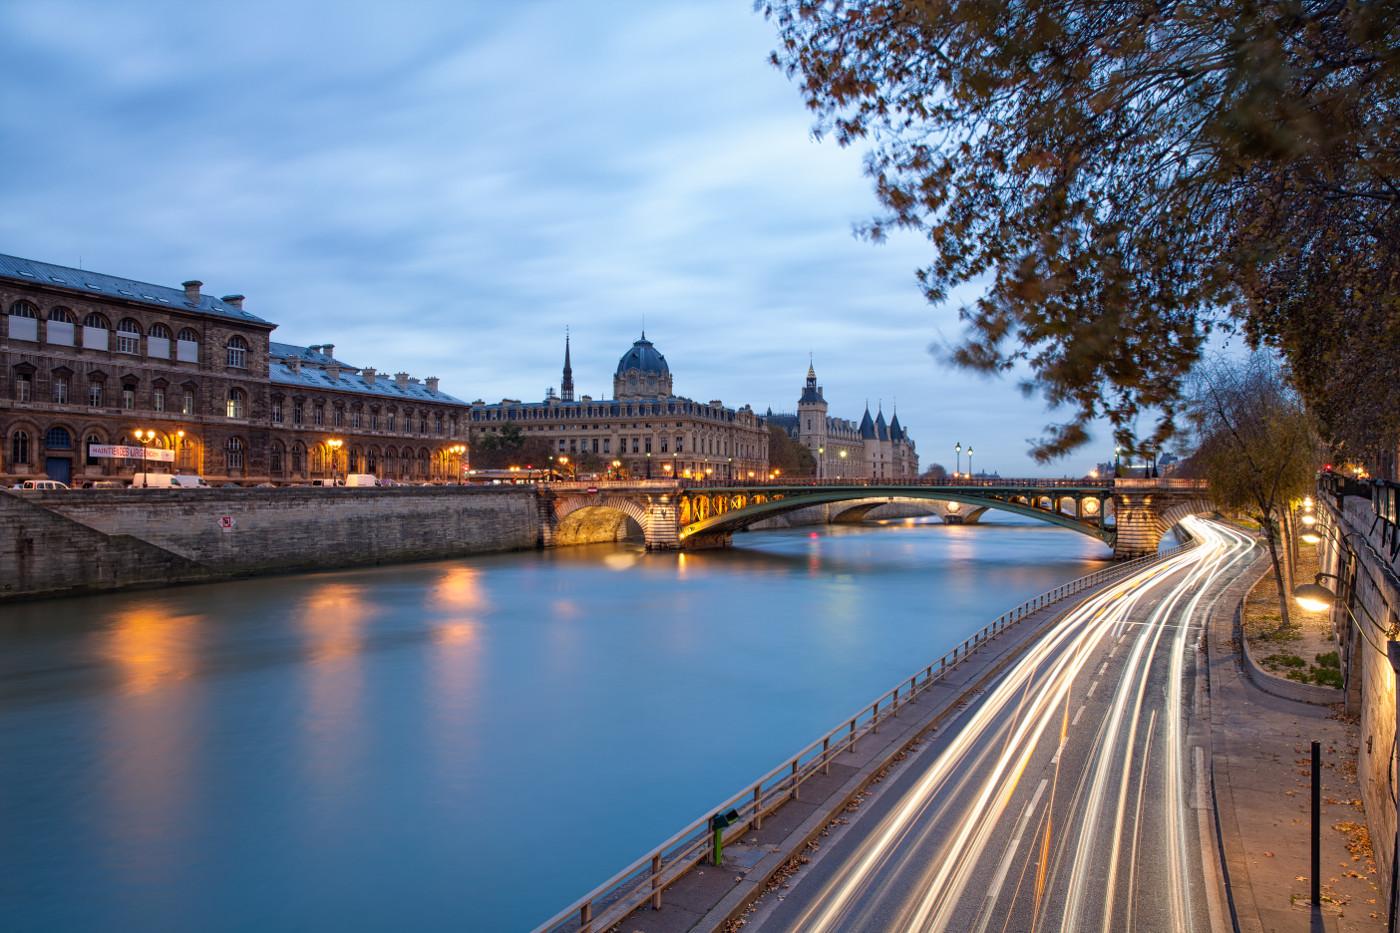 21 Paris Backgrounds Wallpapers Images Pictures  Design Trends  Premium PSD Vector Downloads